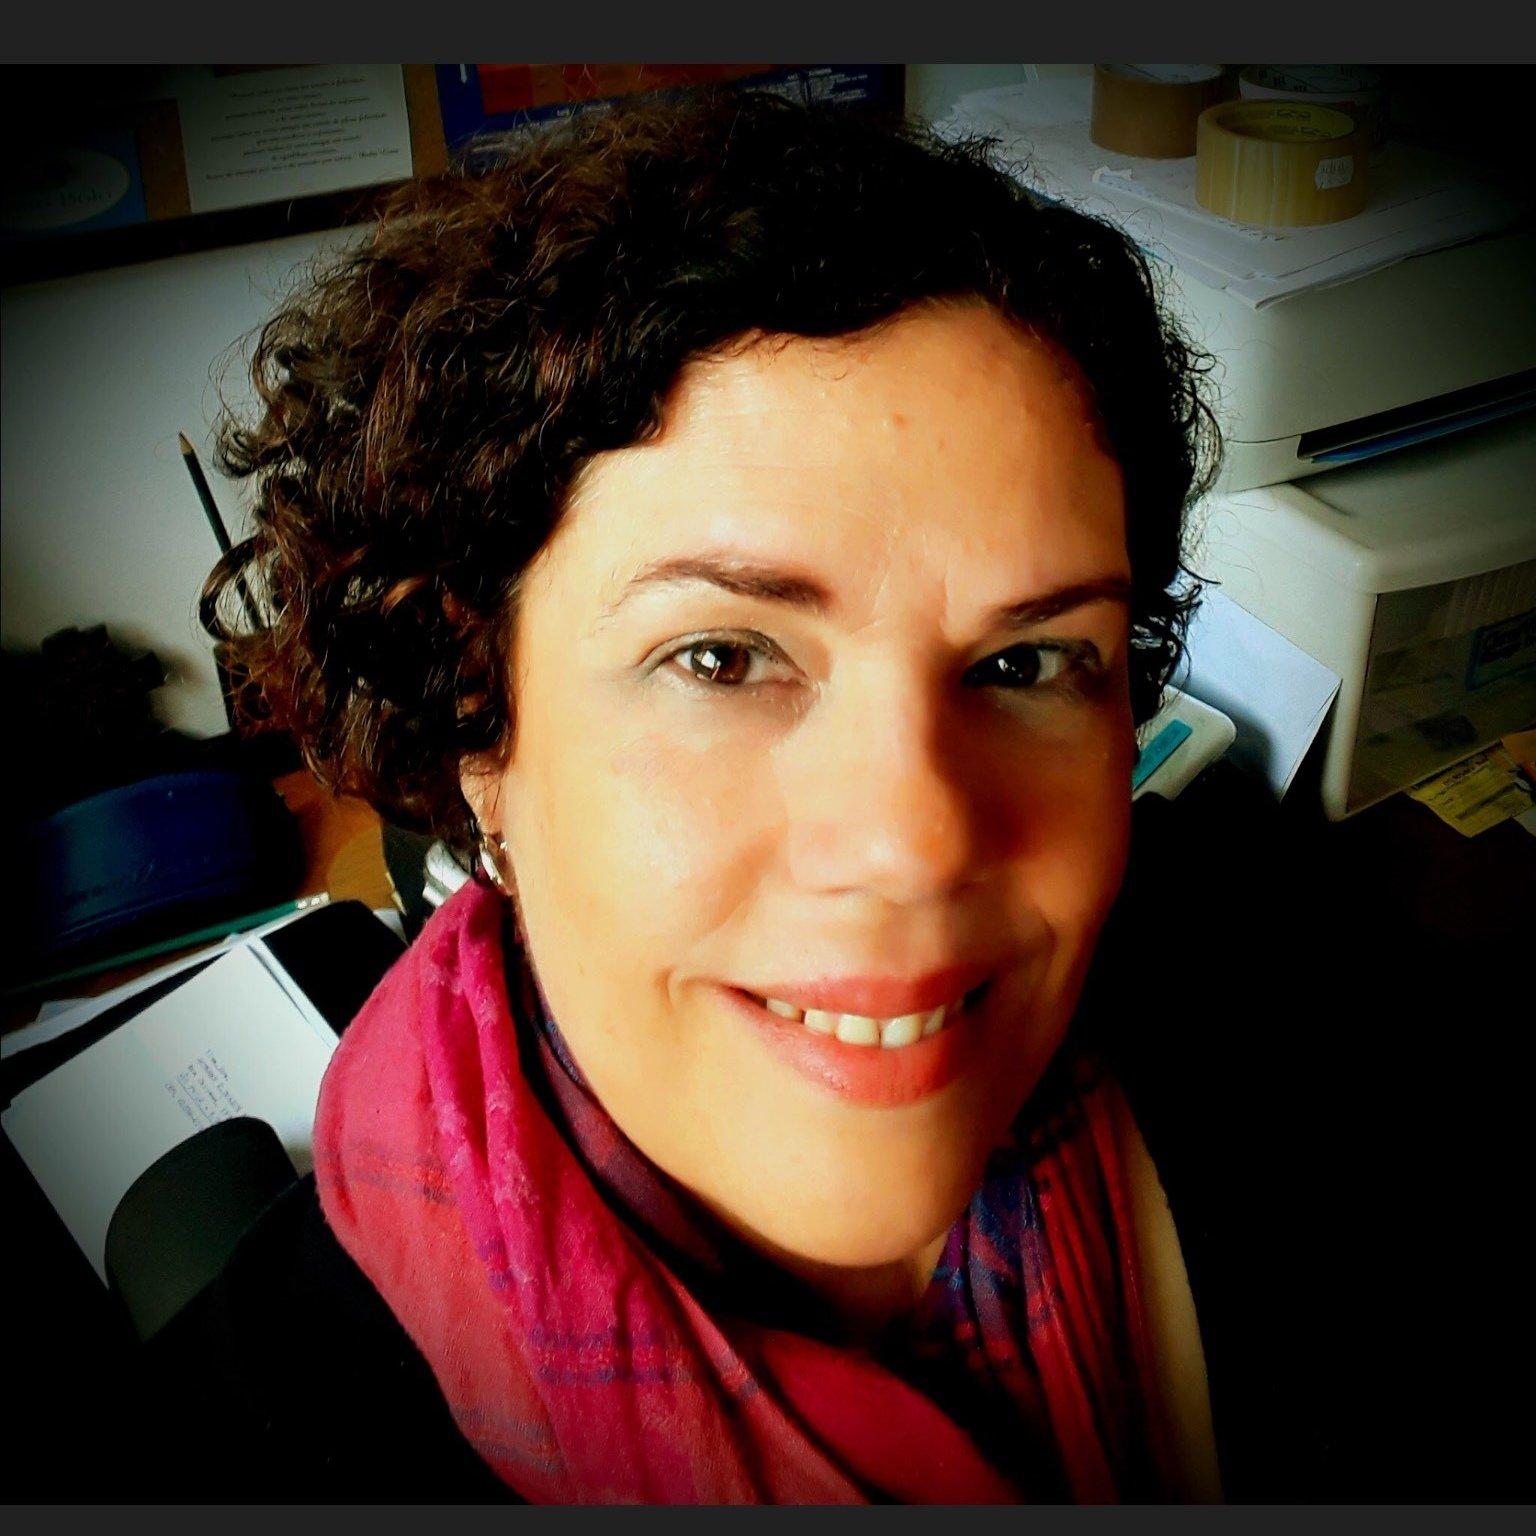 Trilha das Artes, 23/03/2019 - Débora Dornellas